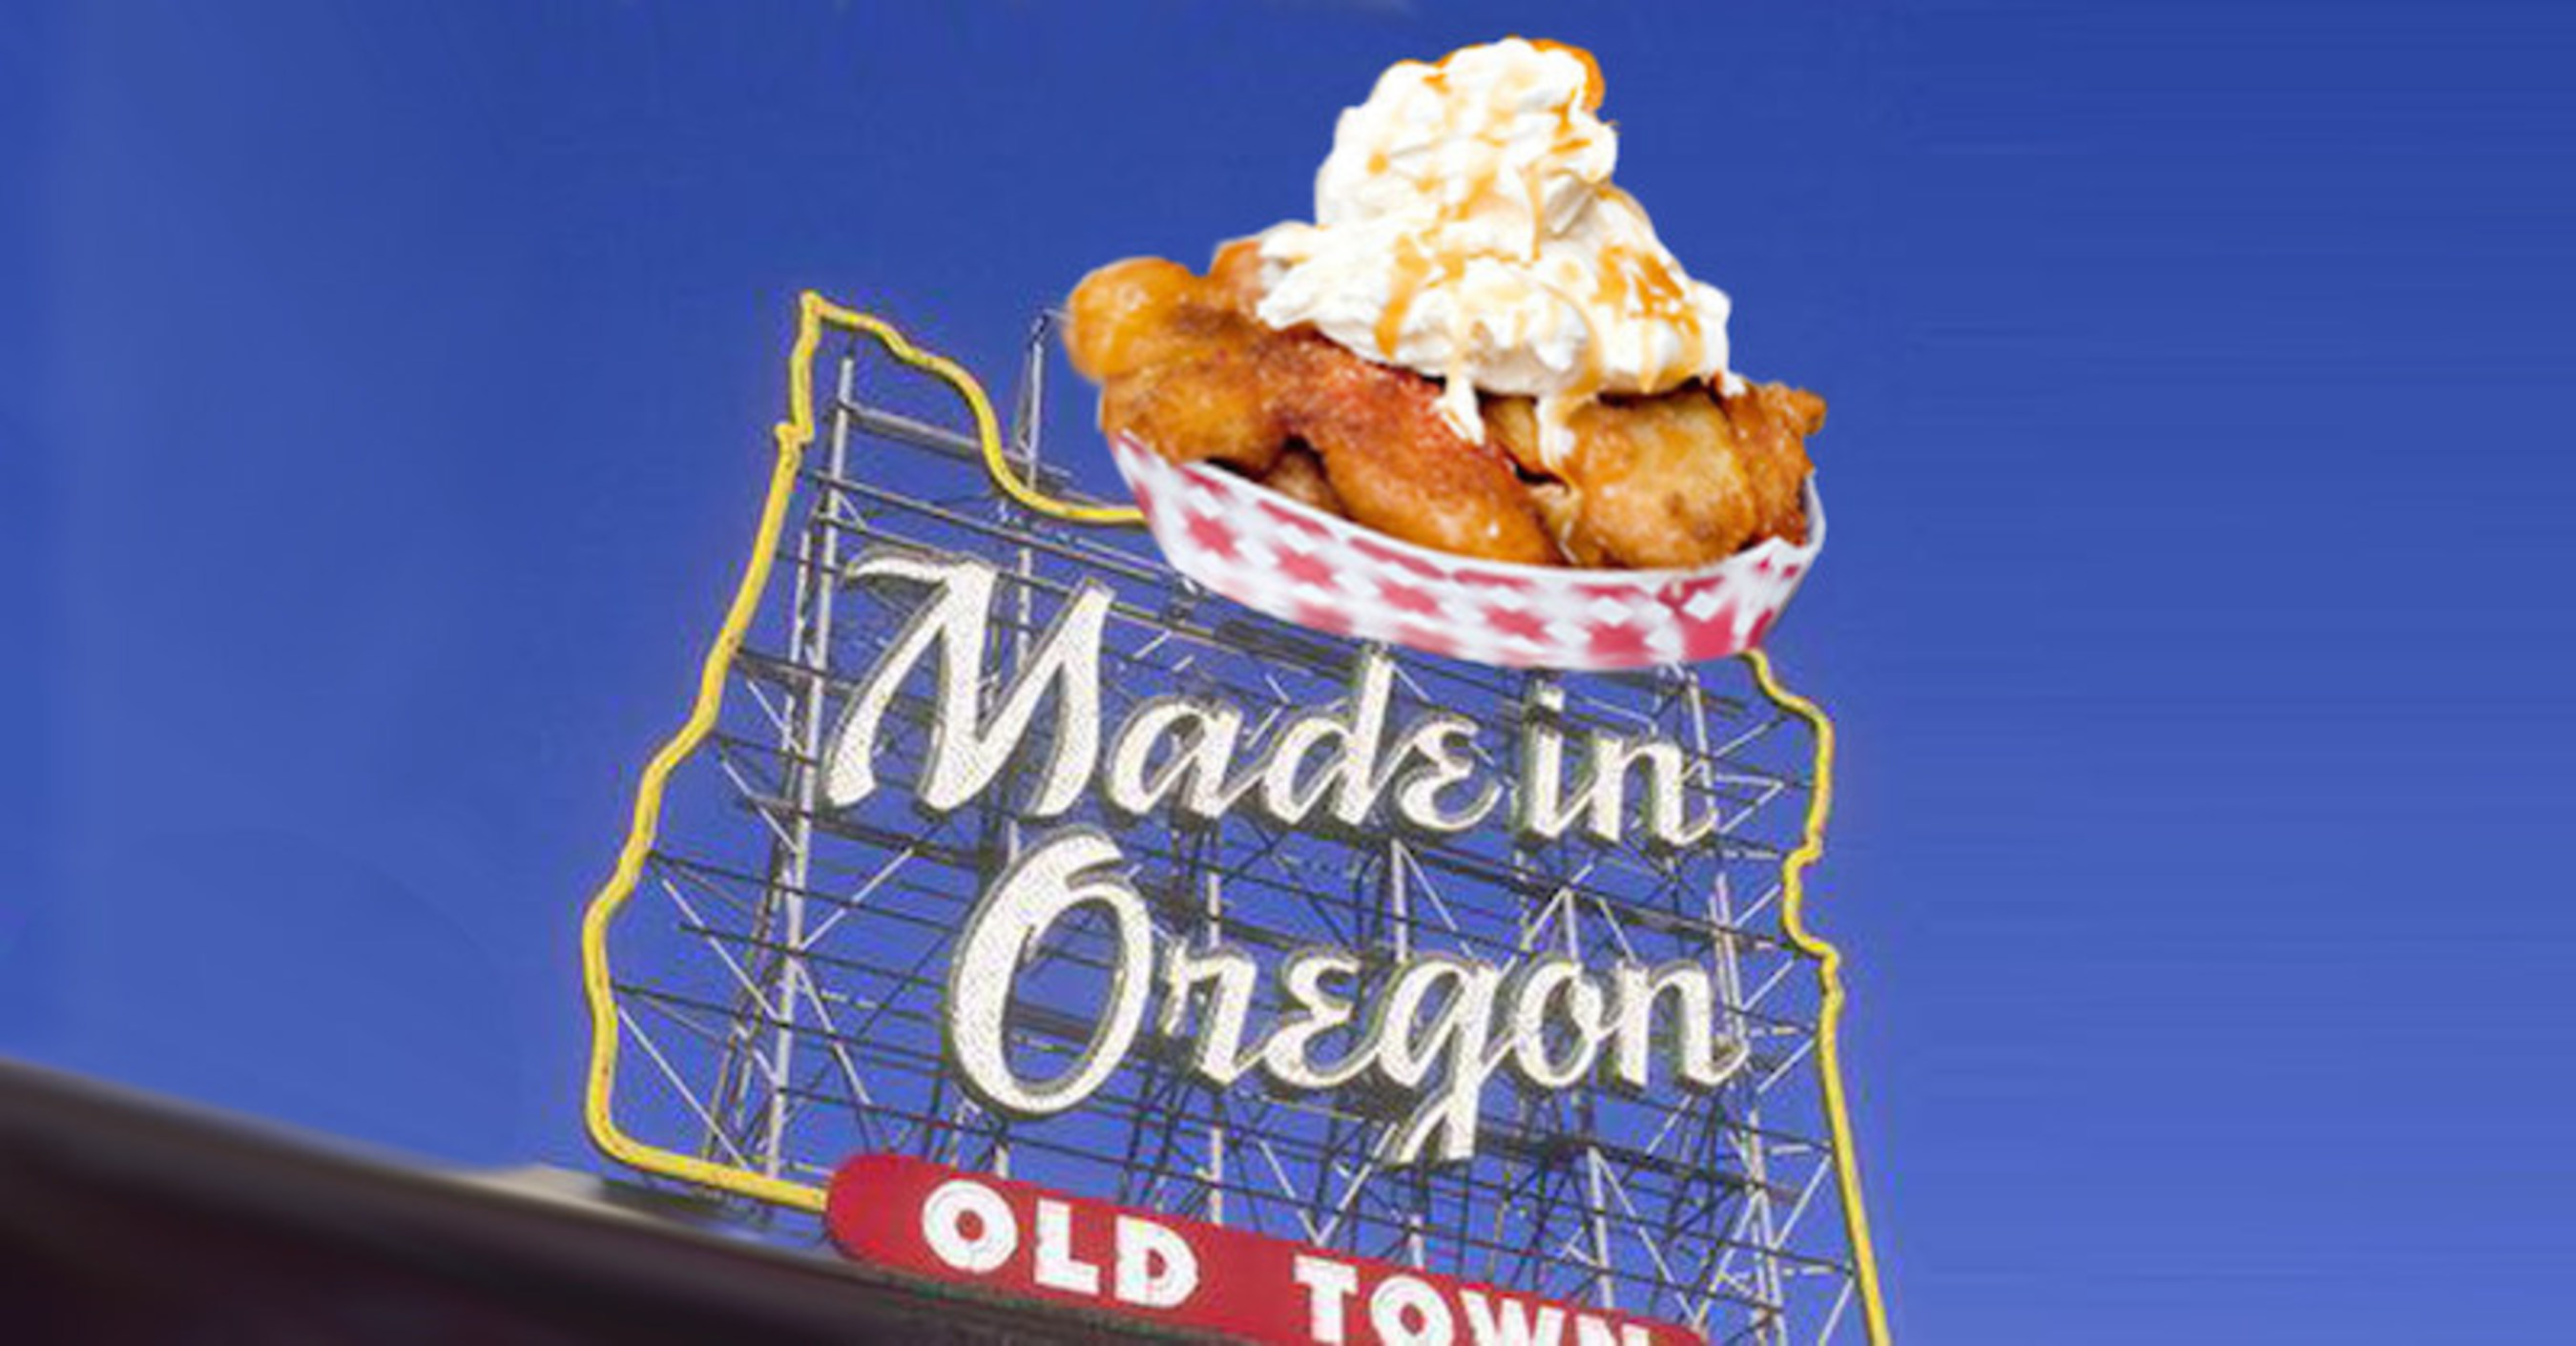 Made in Oregon - Sweet Apple Pie Fries! (PRNewsFoto/Sweet Apple Pie Fries!)